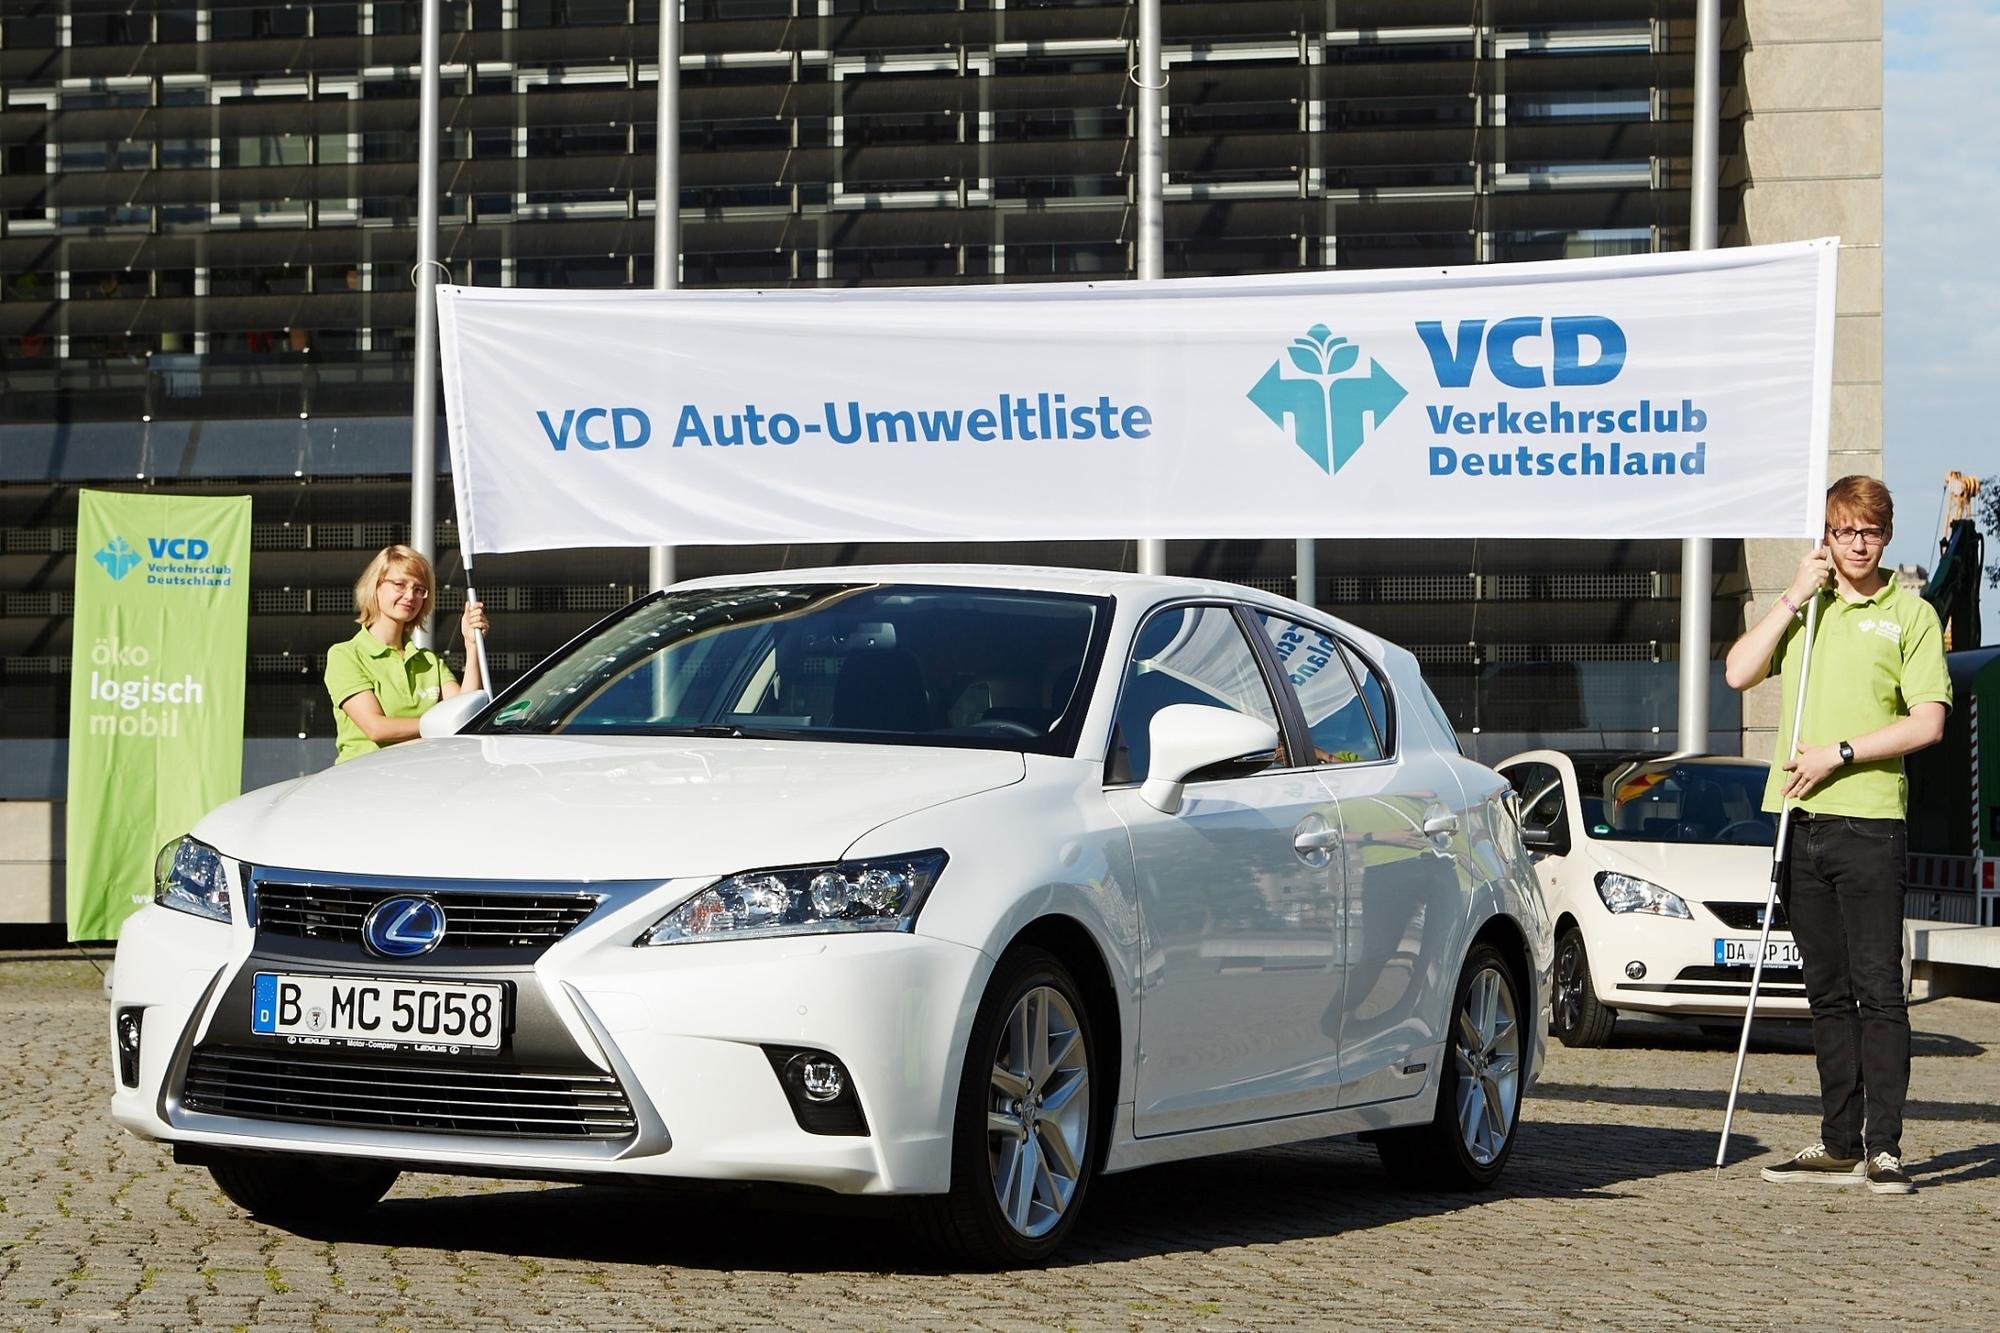 VCD Auto-Umweltliste - Besonders öko